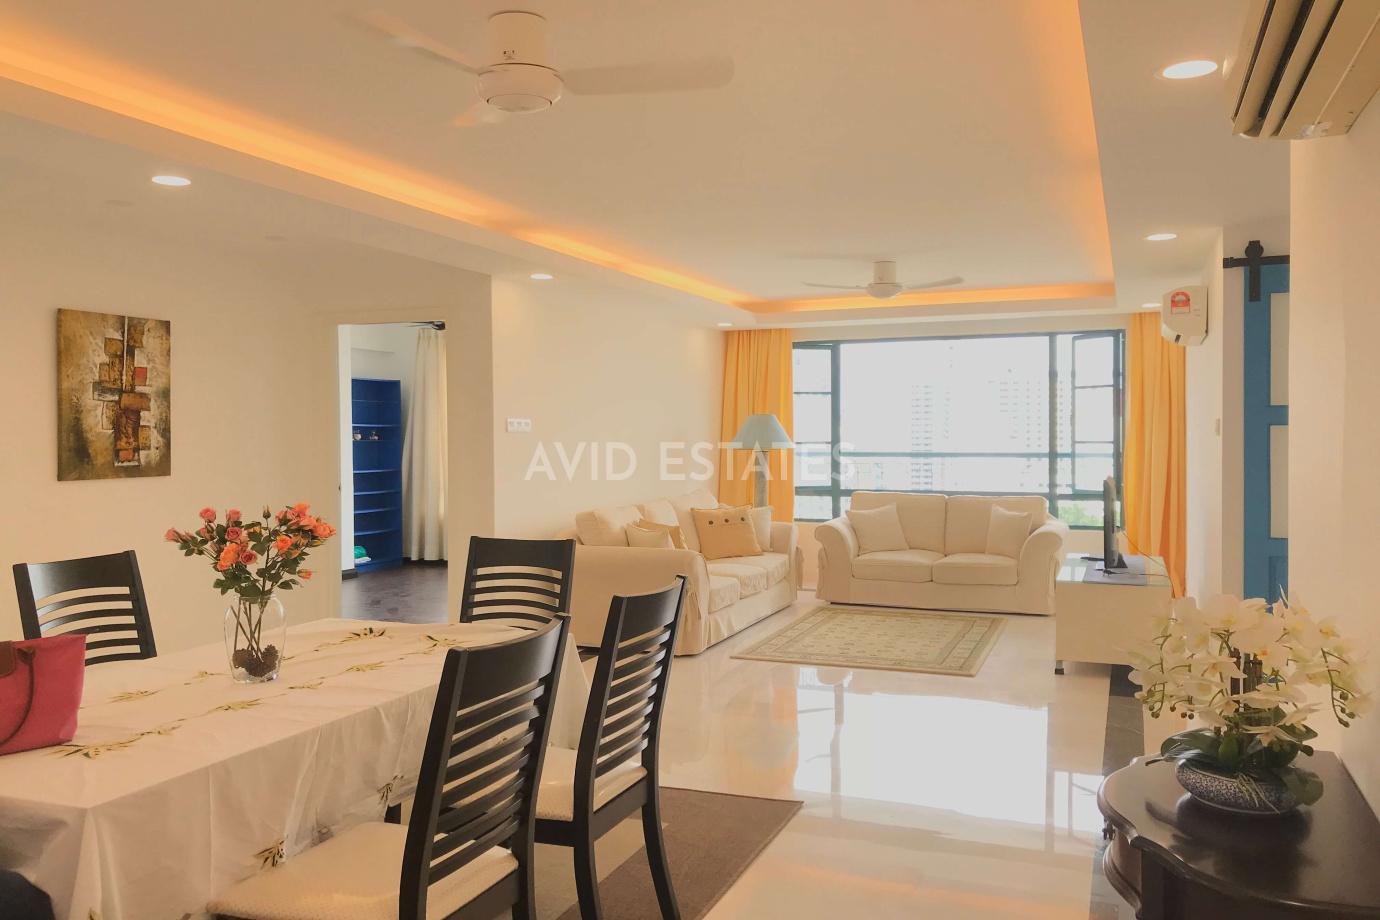 202 Desa Cahaya, Ampang Hilir,Kuala Lumpur, 3 Bedrooms Bedrooms, ,4 BathroomsBathrooms,Condominium / Serviced Residence,For Sale,Ampang,2174